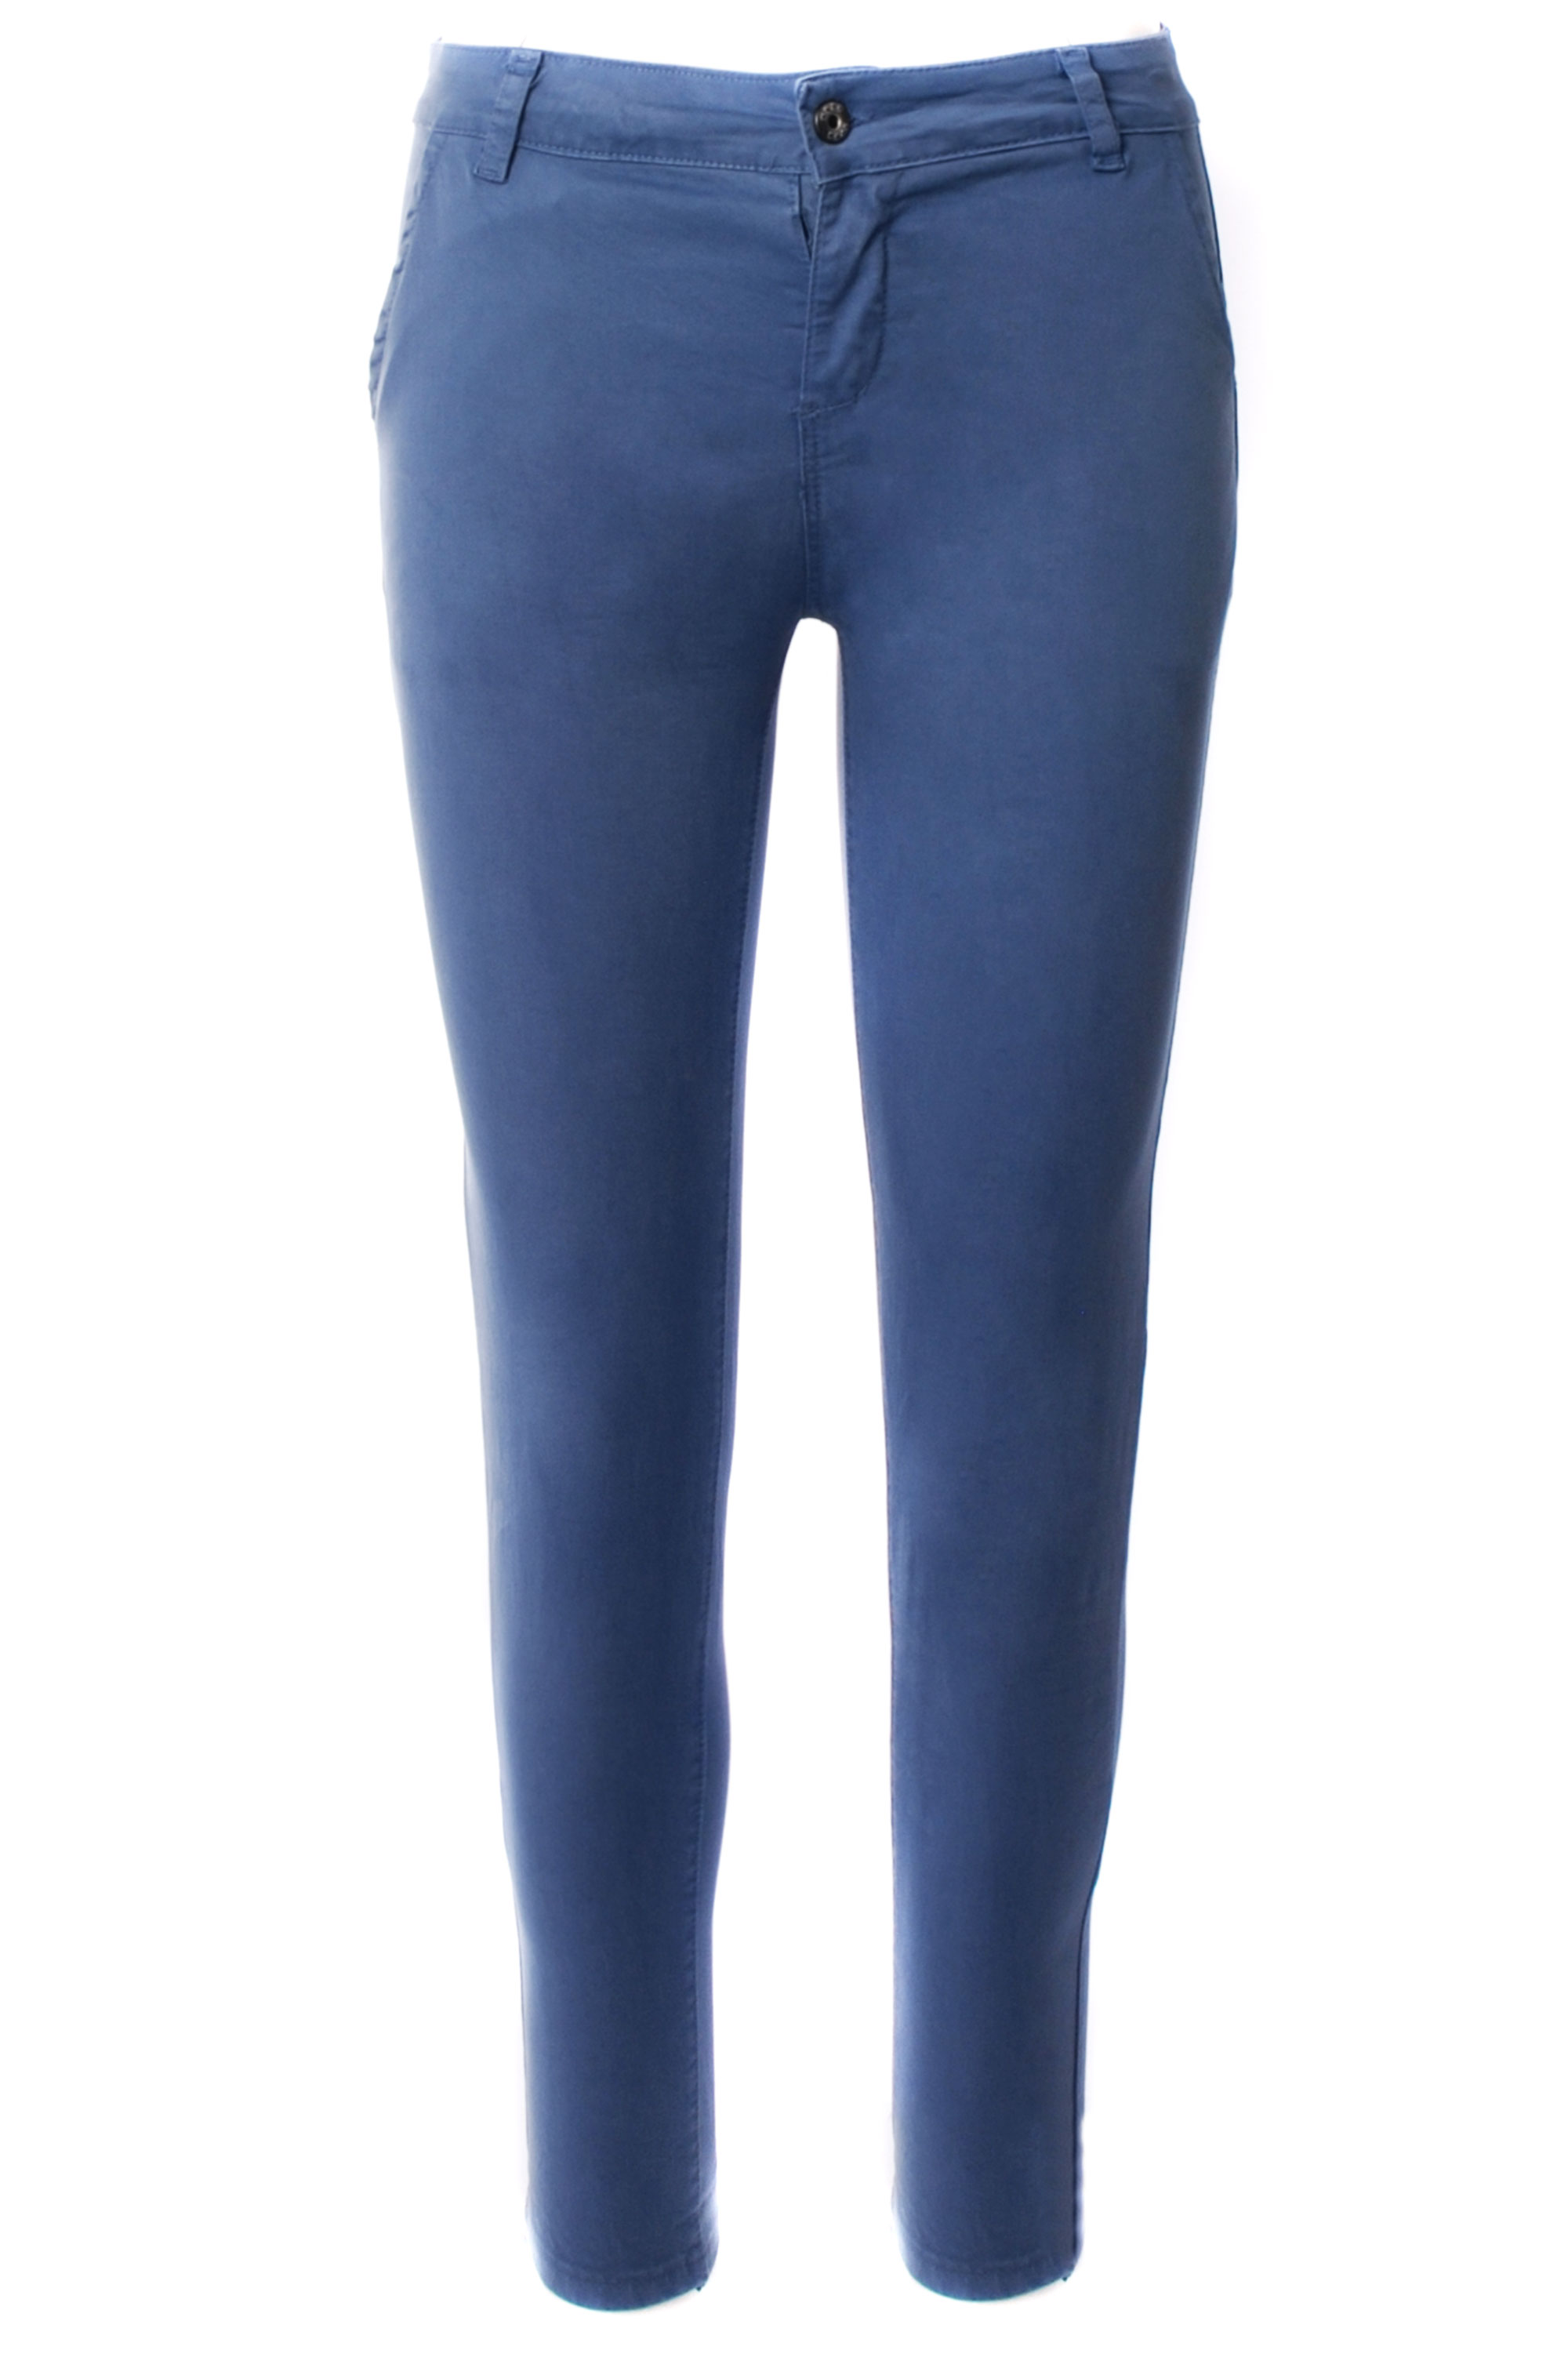 Spodnie - 146-168165 JE - Unisono